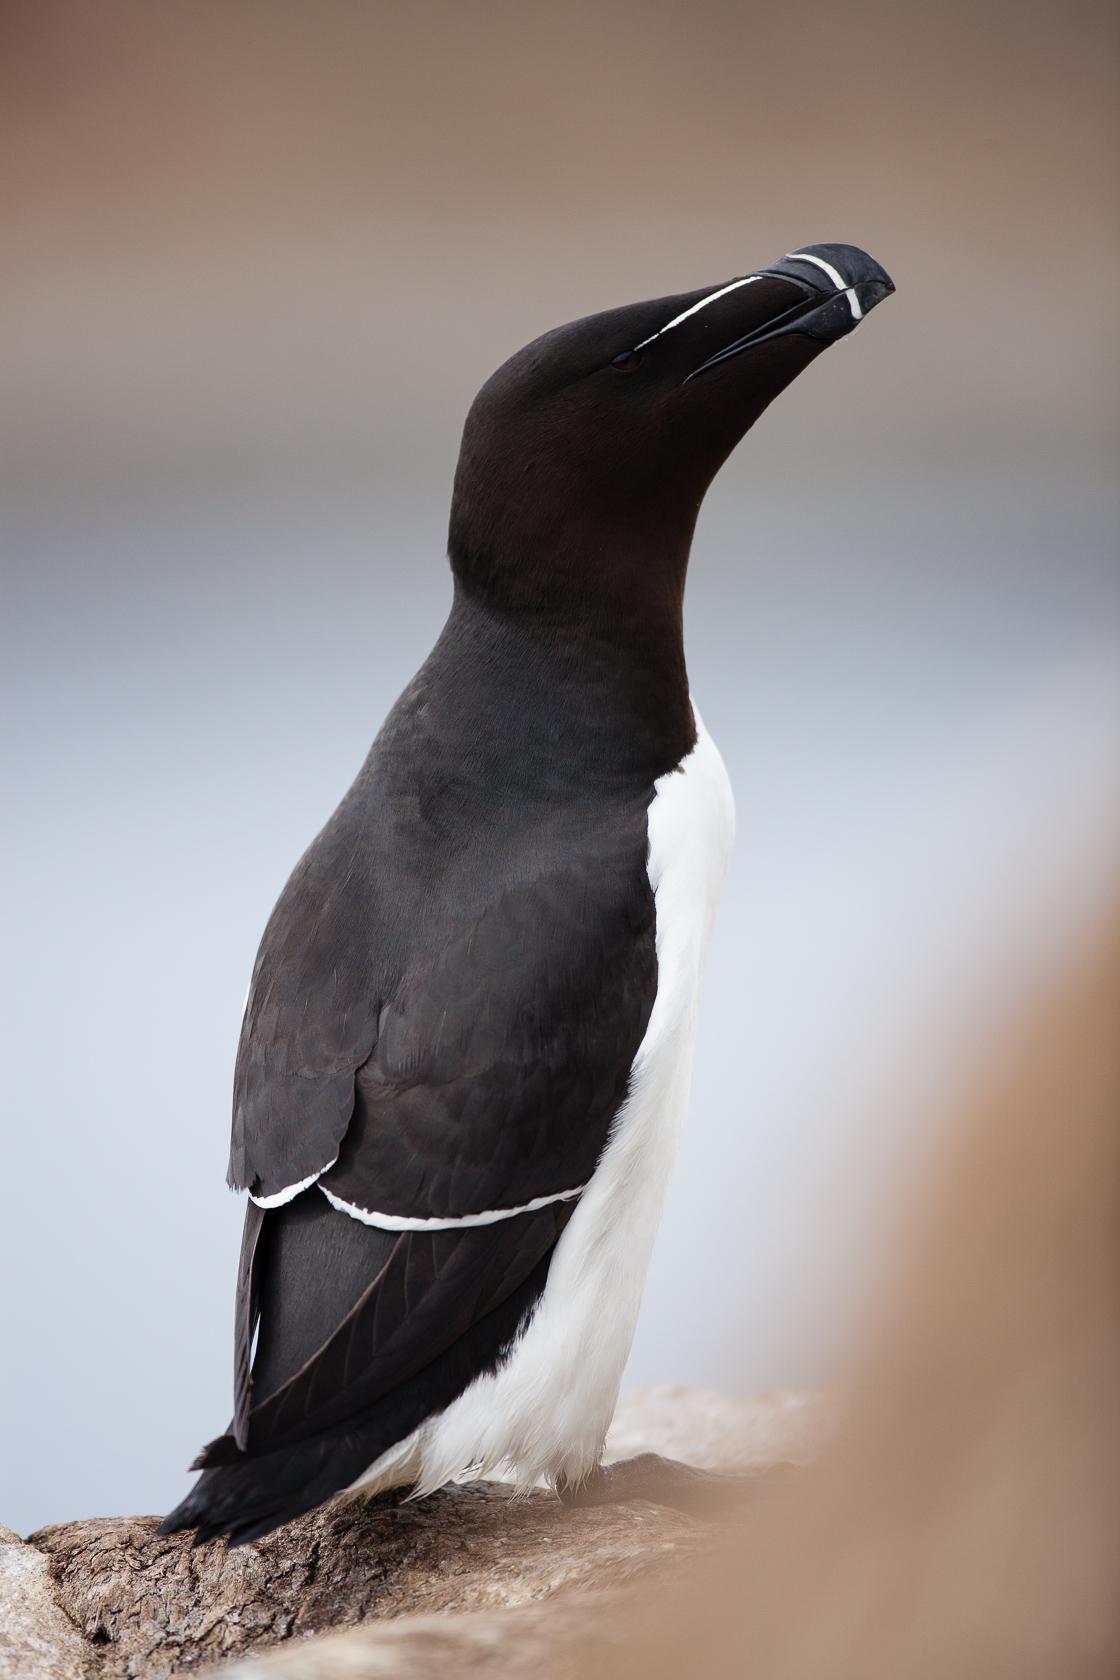 Pingouin torda (Alca torda) sur l'île d'Hornøya, en Norvège